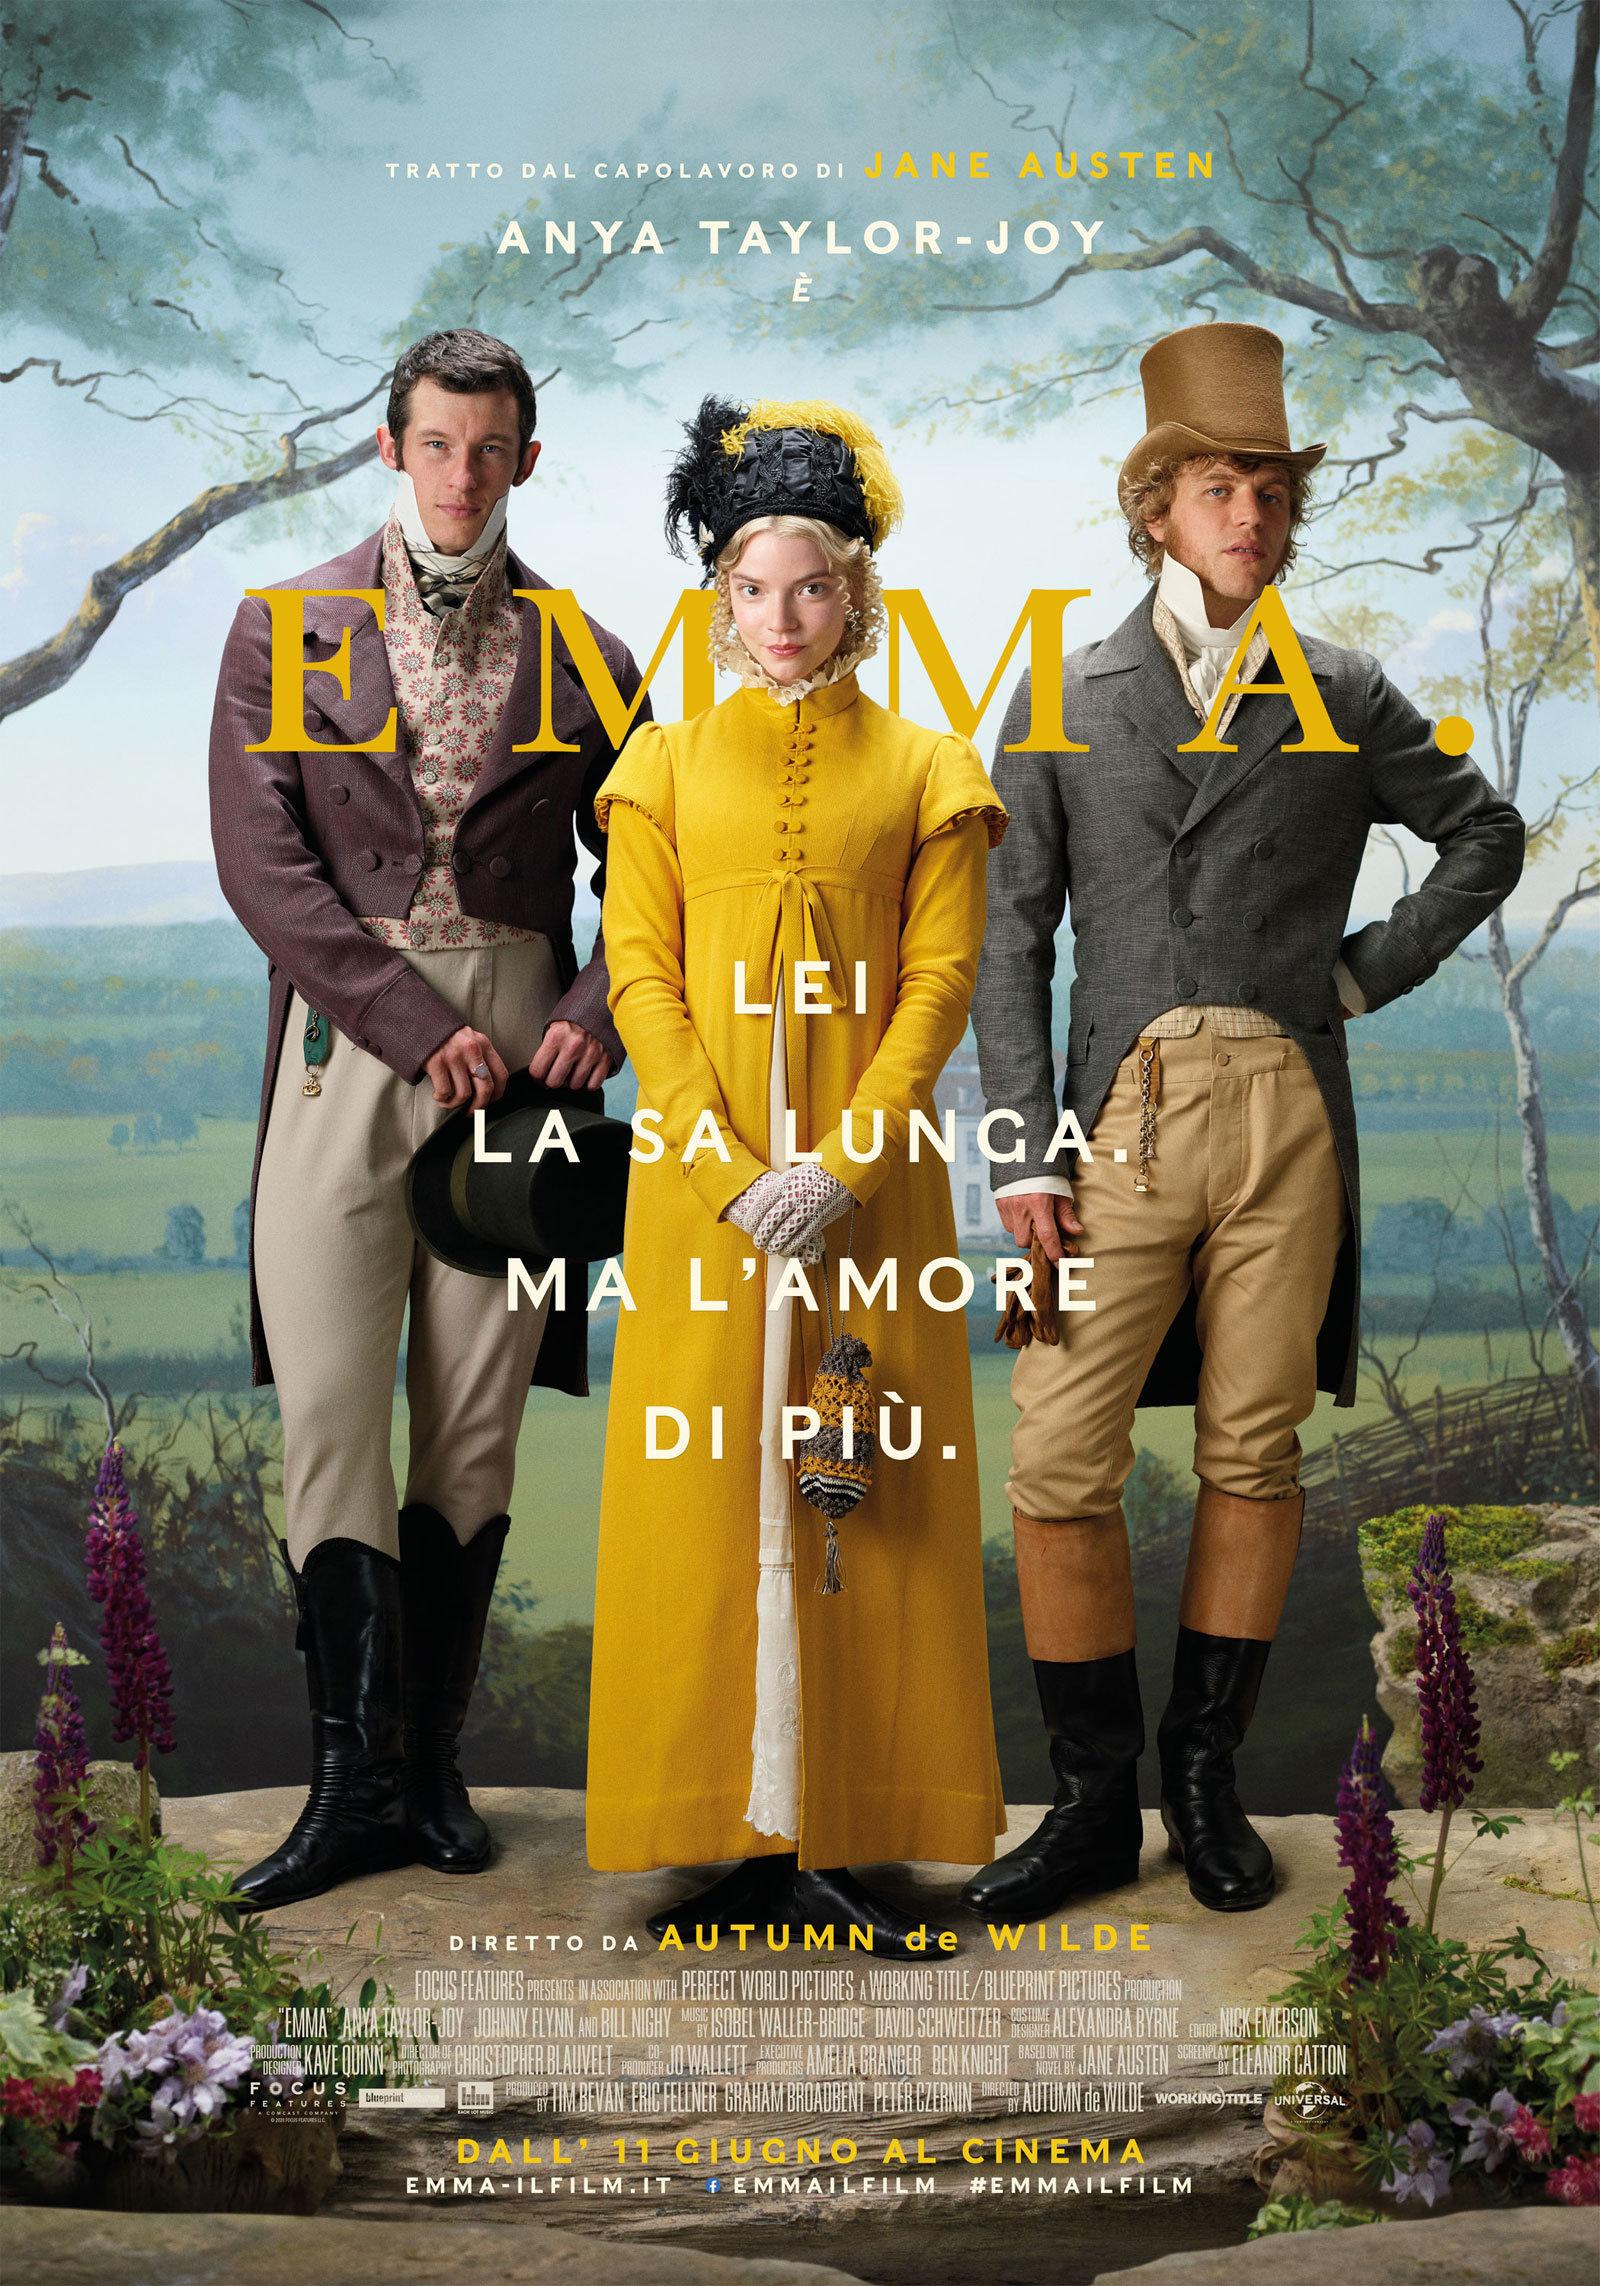 Emma. il poster